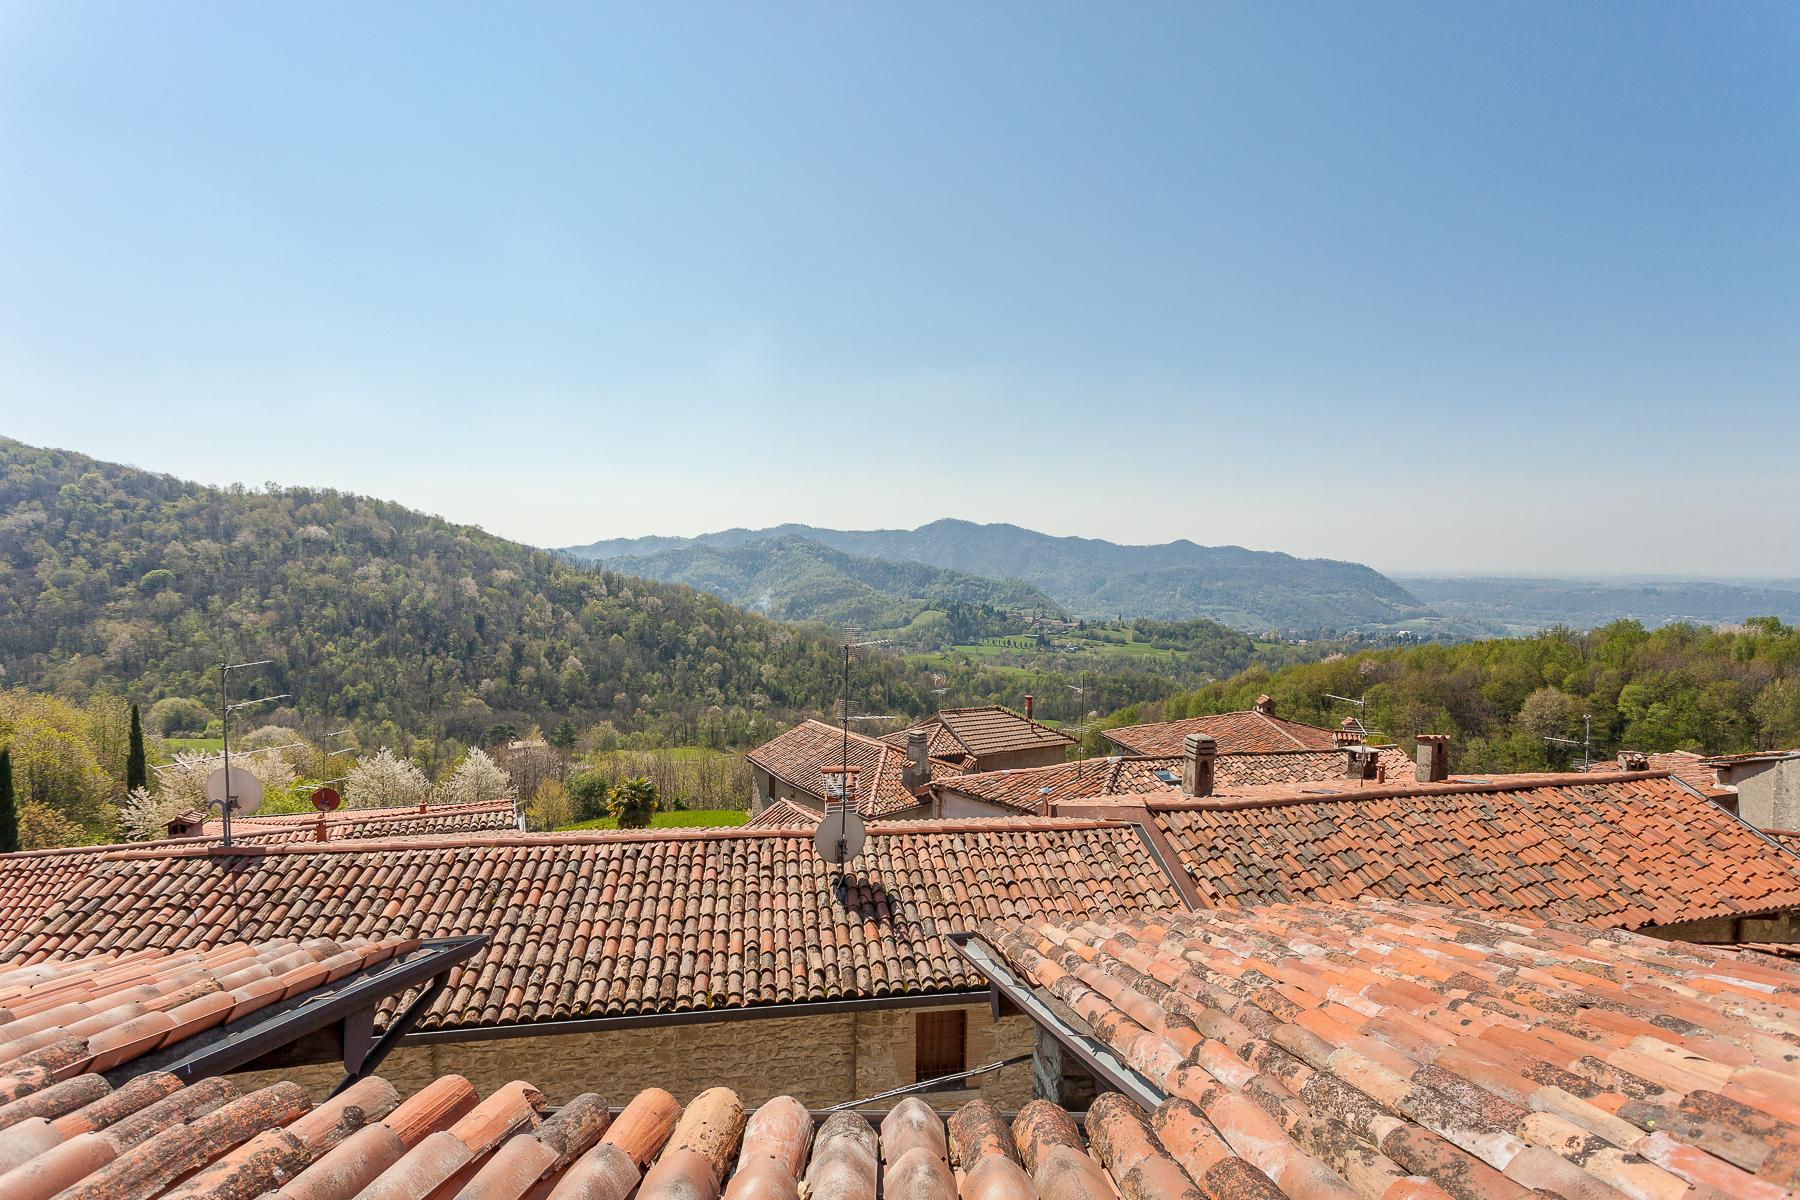 Casa indipendente in Vendita a Caprino Bergamasco: 5 locali, 500 mq - Foto 17